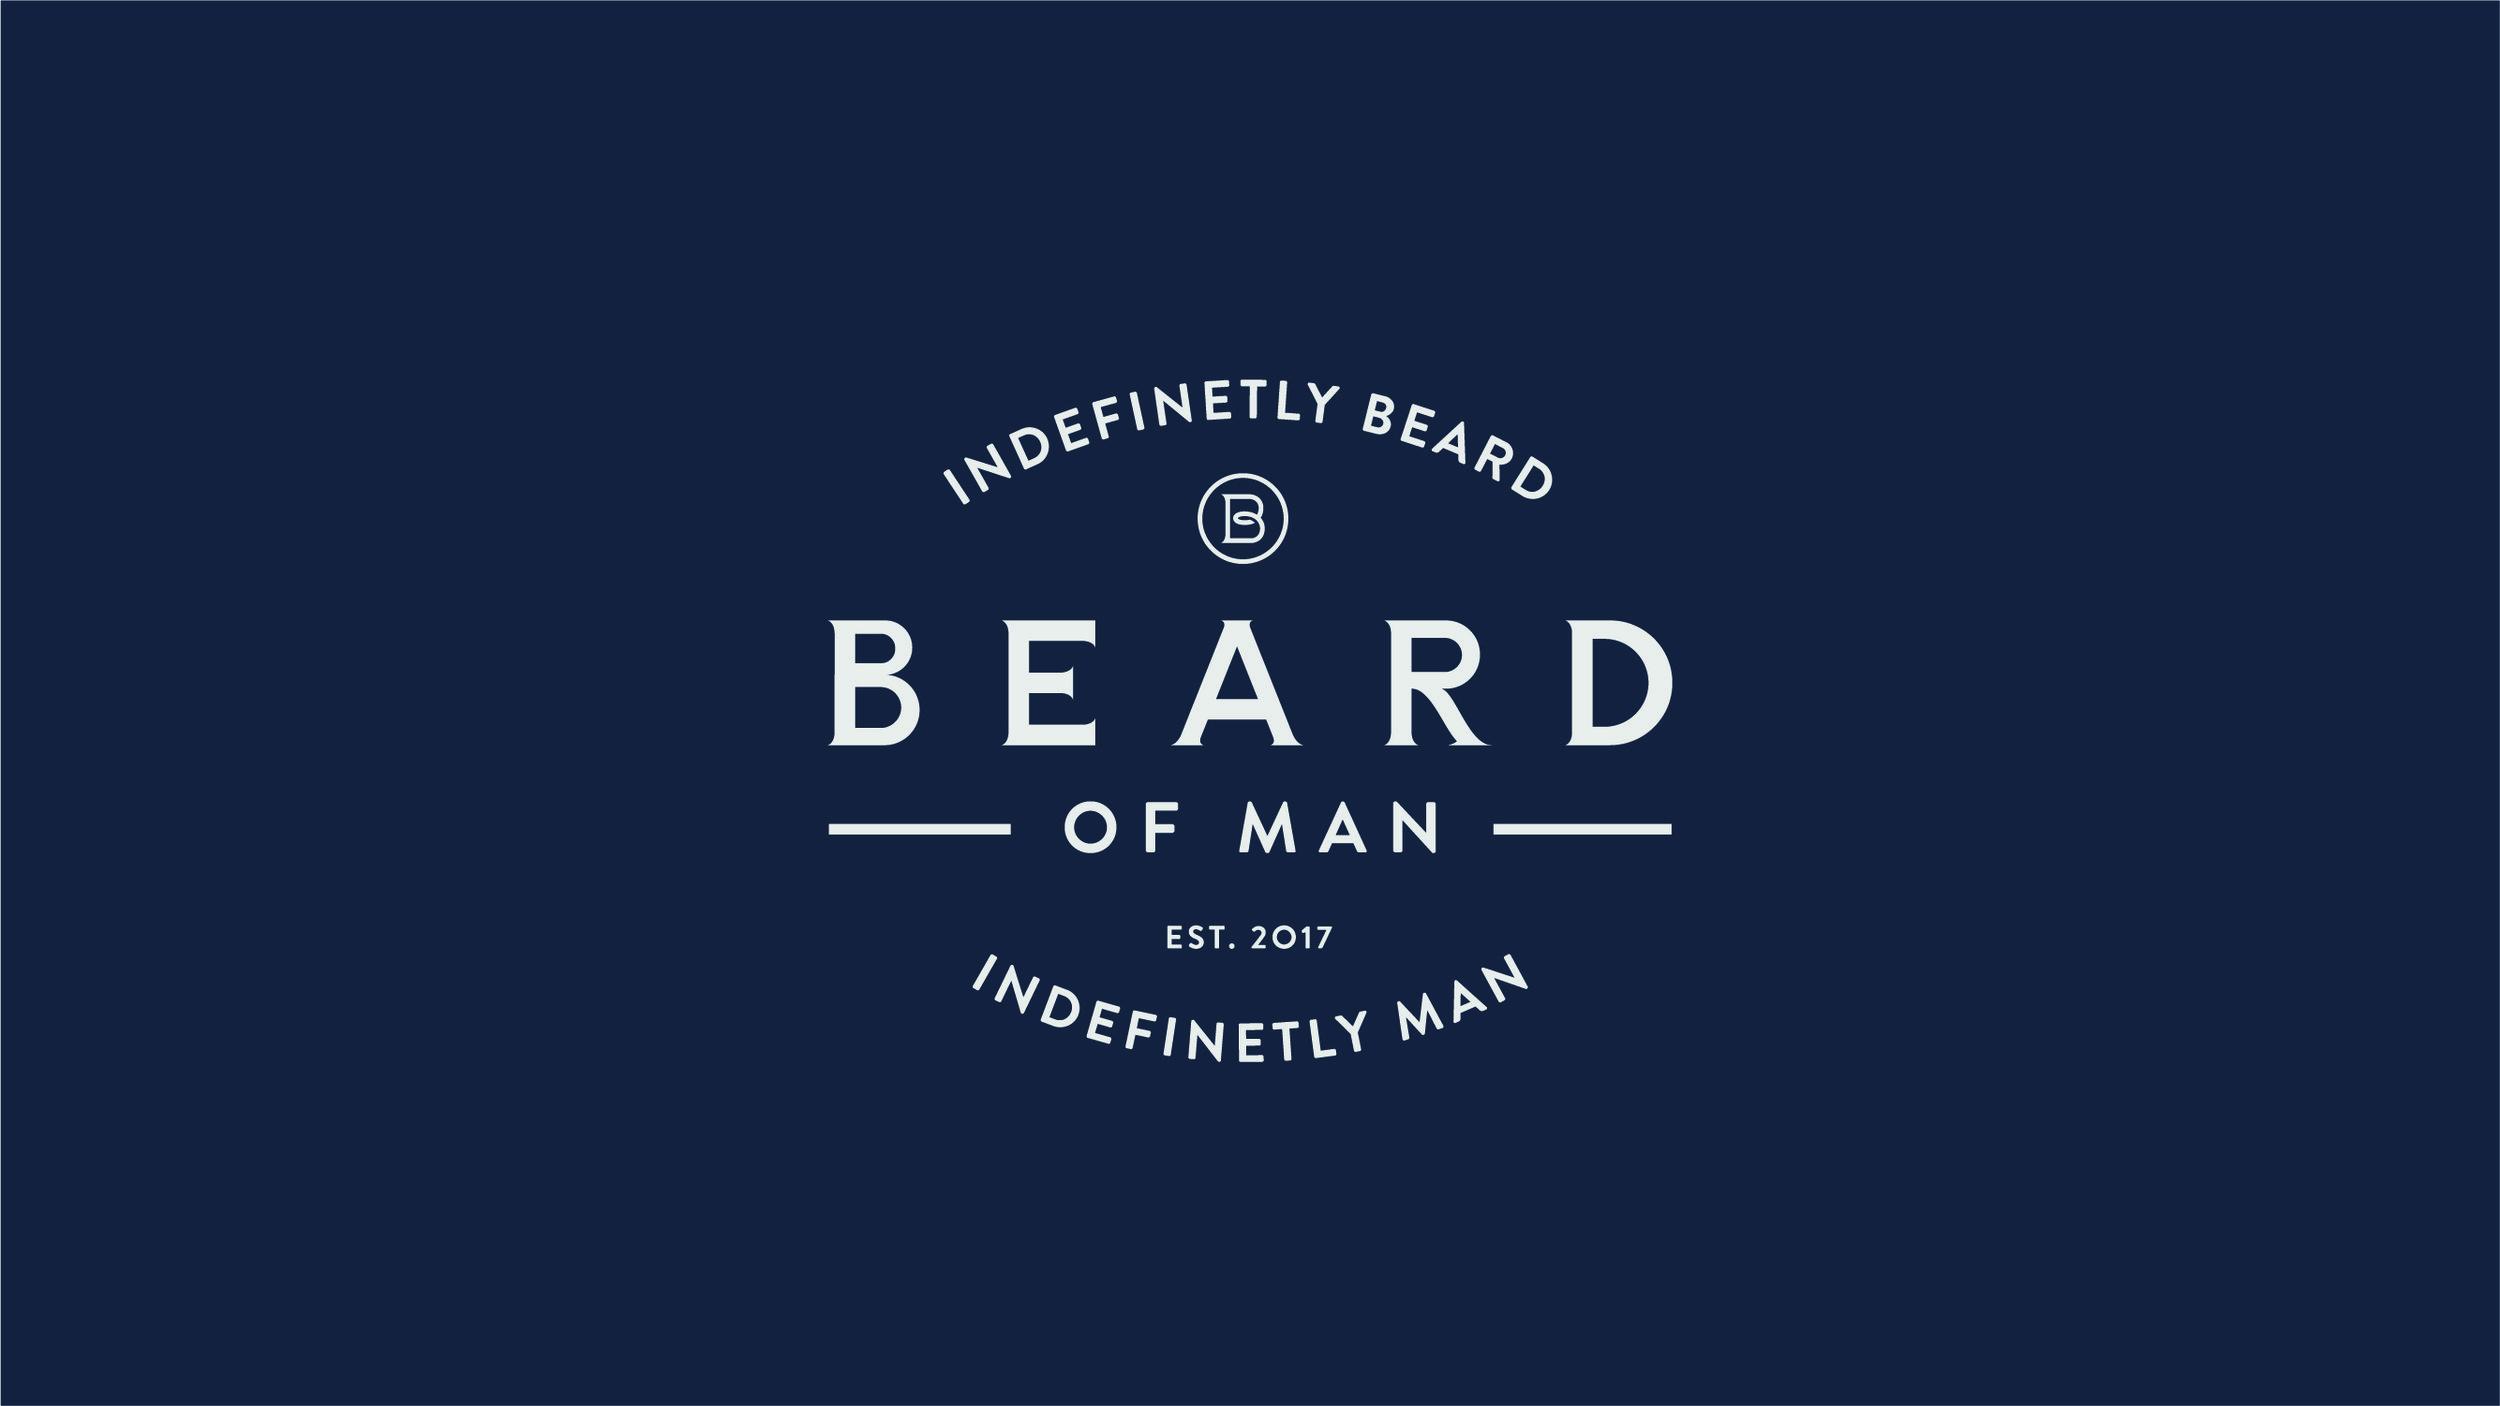 Beard Of Man Company Rebrand.